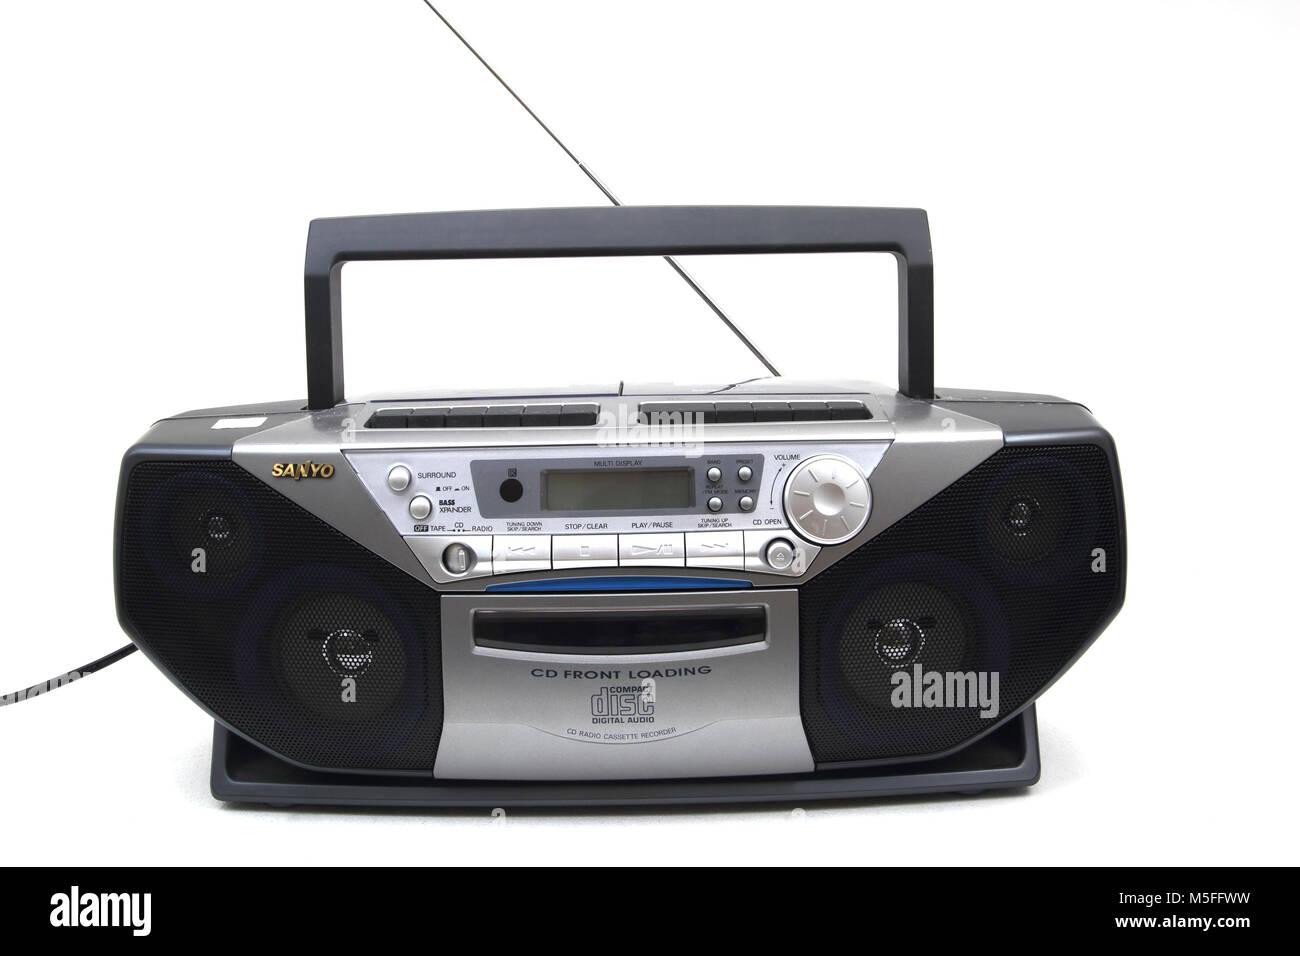 Sanyo Portable CD Radio Cassette Recorder Stock Photo